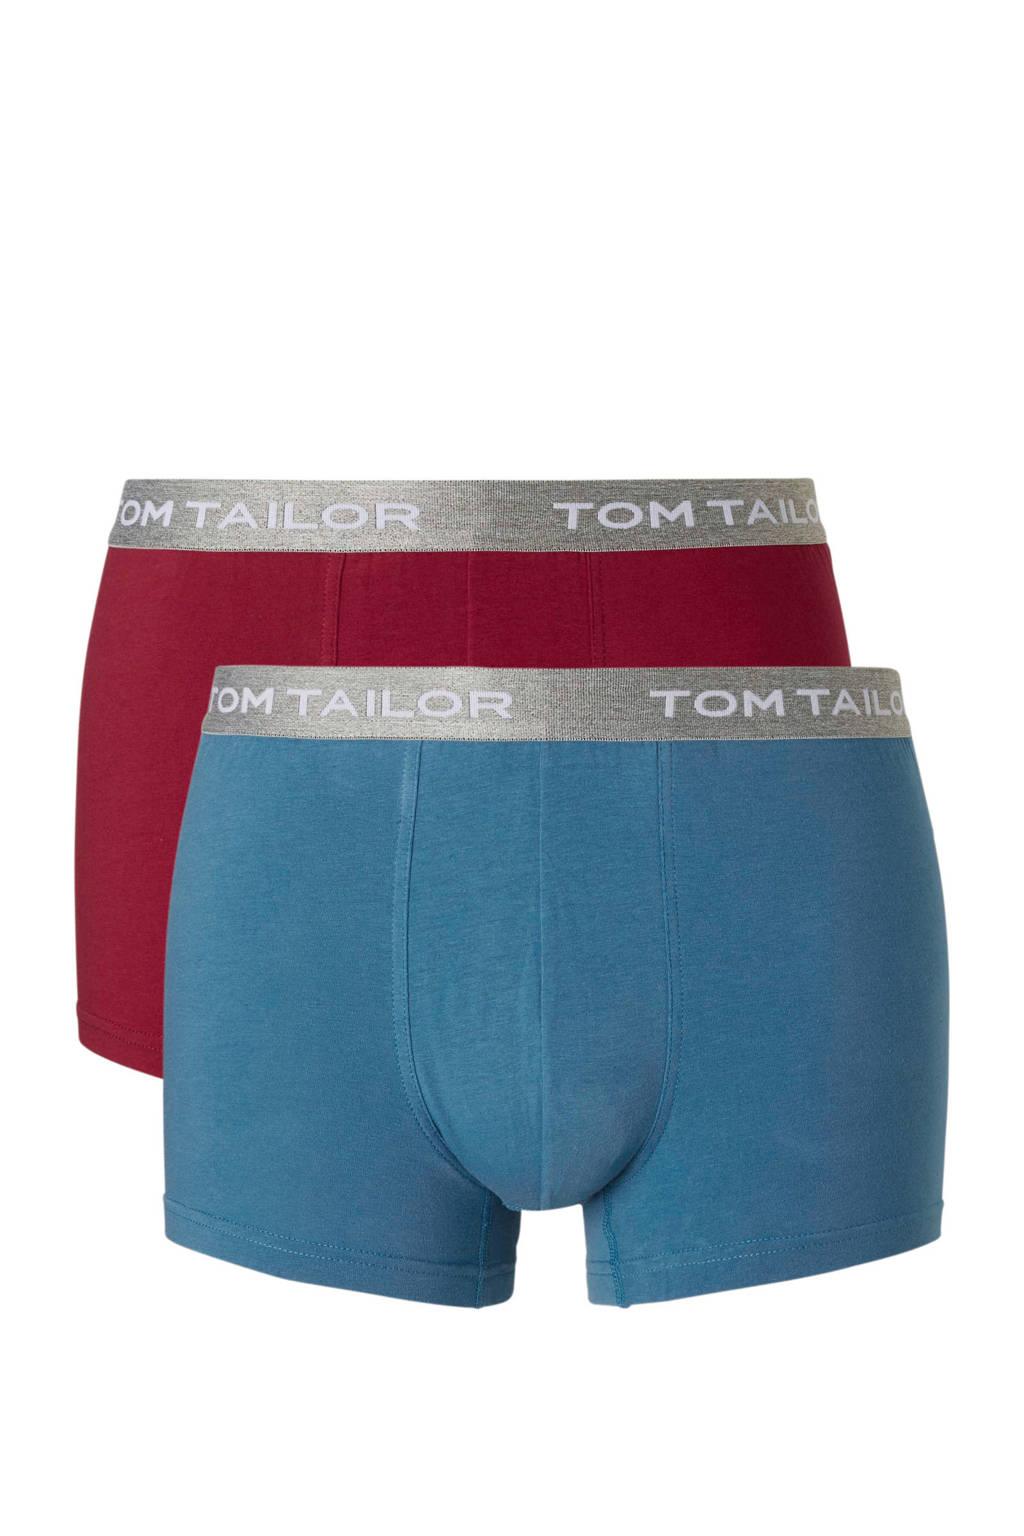 Tom Tailor boxershort (set van 2), Blauw/bordeaux